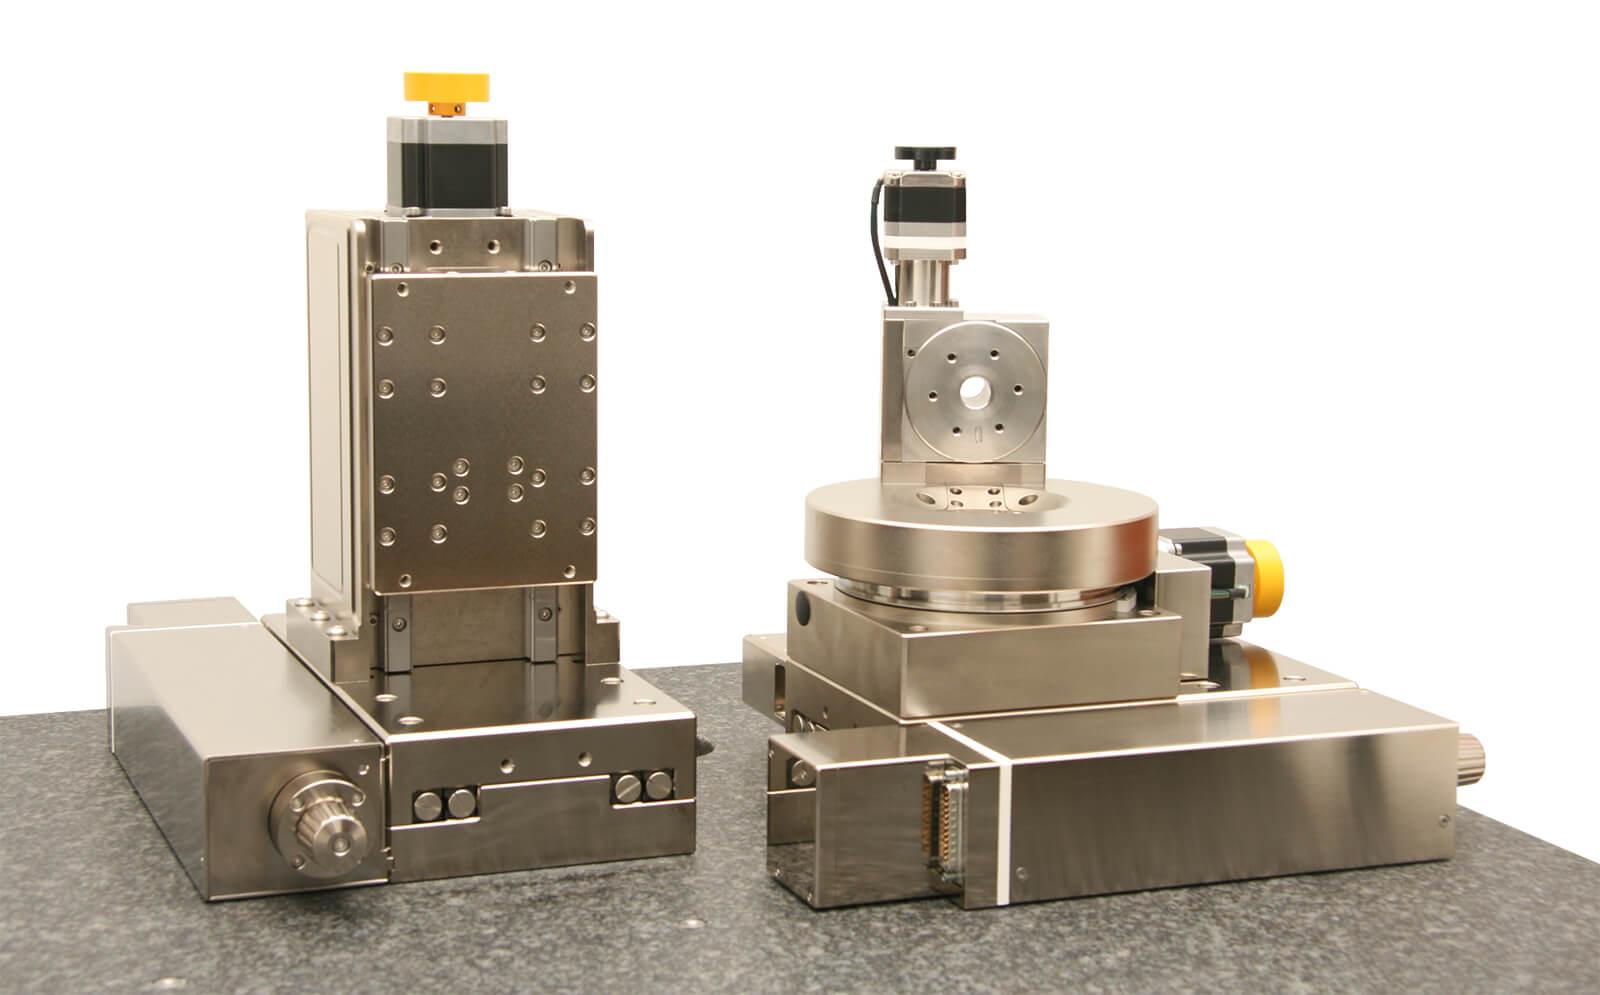 5 Axis Platform Metrology System - Nickel Plated